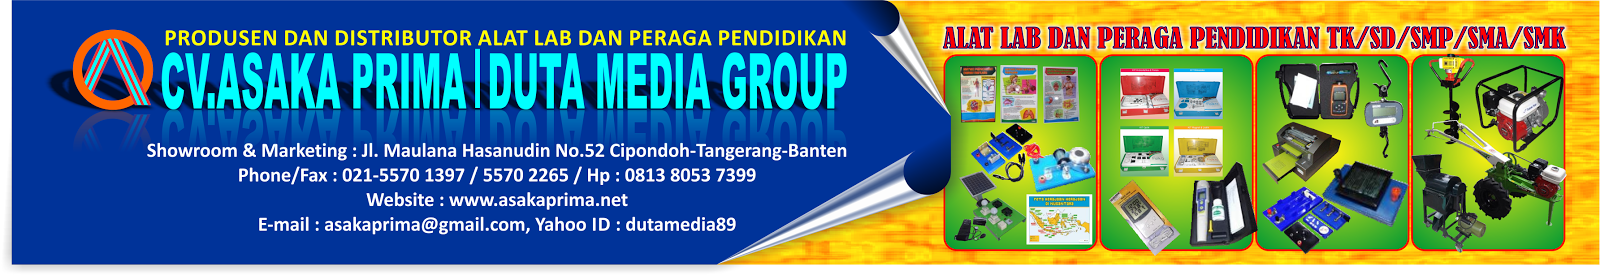 PUBLIC ADDRESS BKKBN # ASAKA PRIMA|DUTA MEDIA GROUP